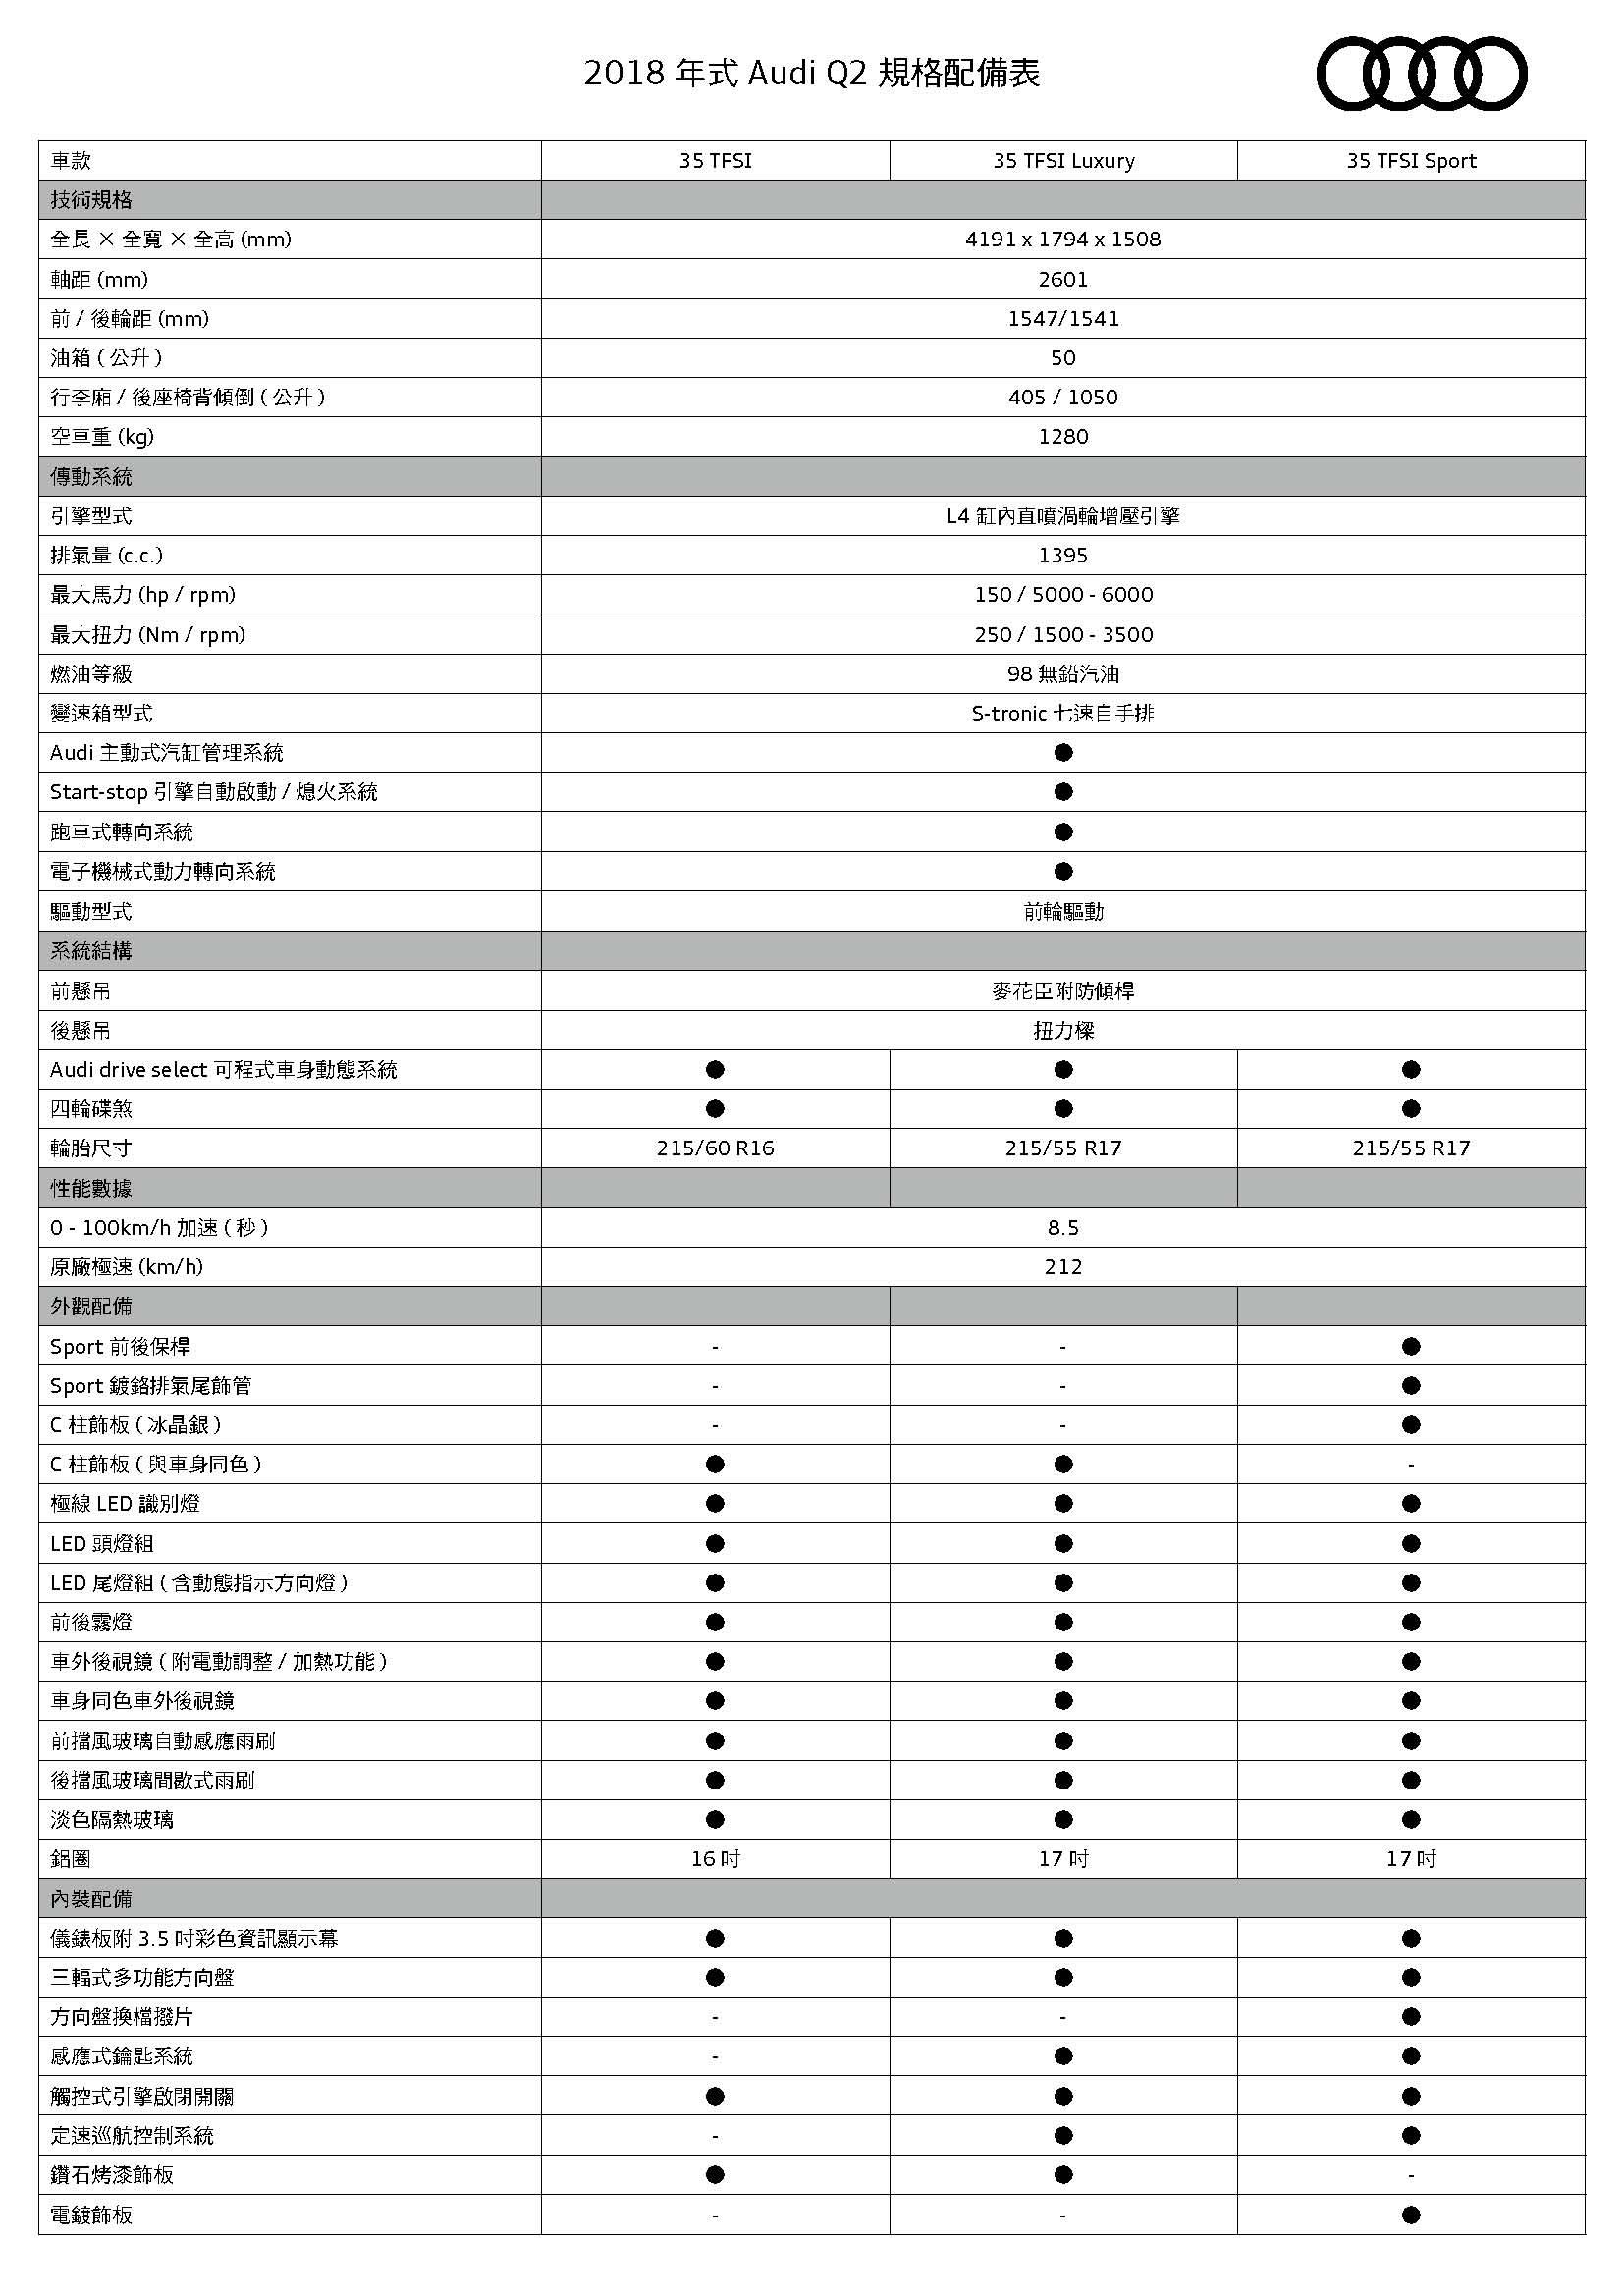 Audi Q2規配表_頁面_1